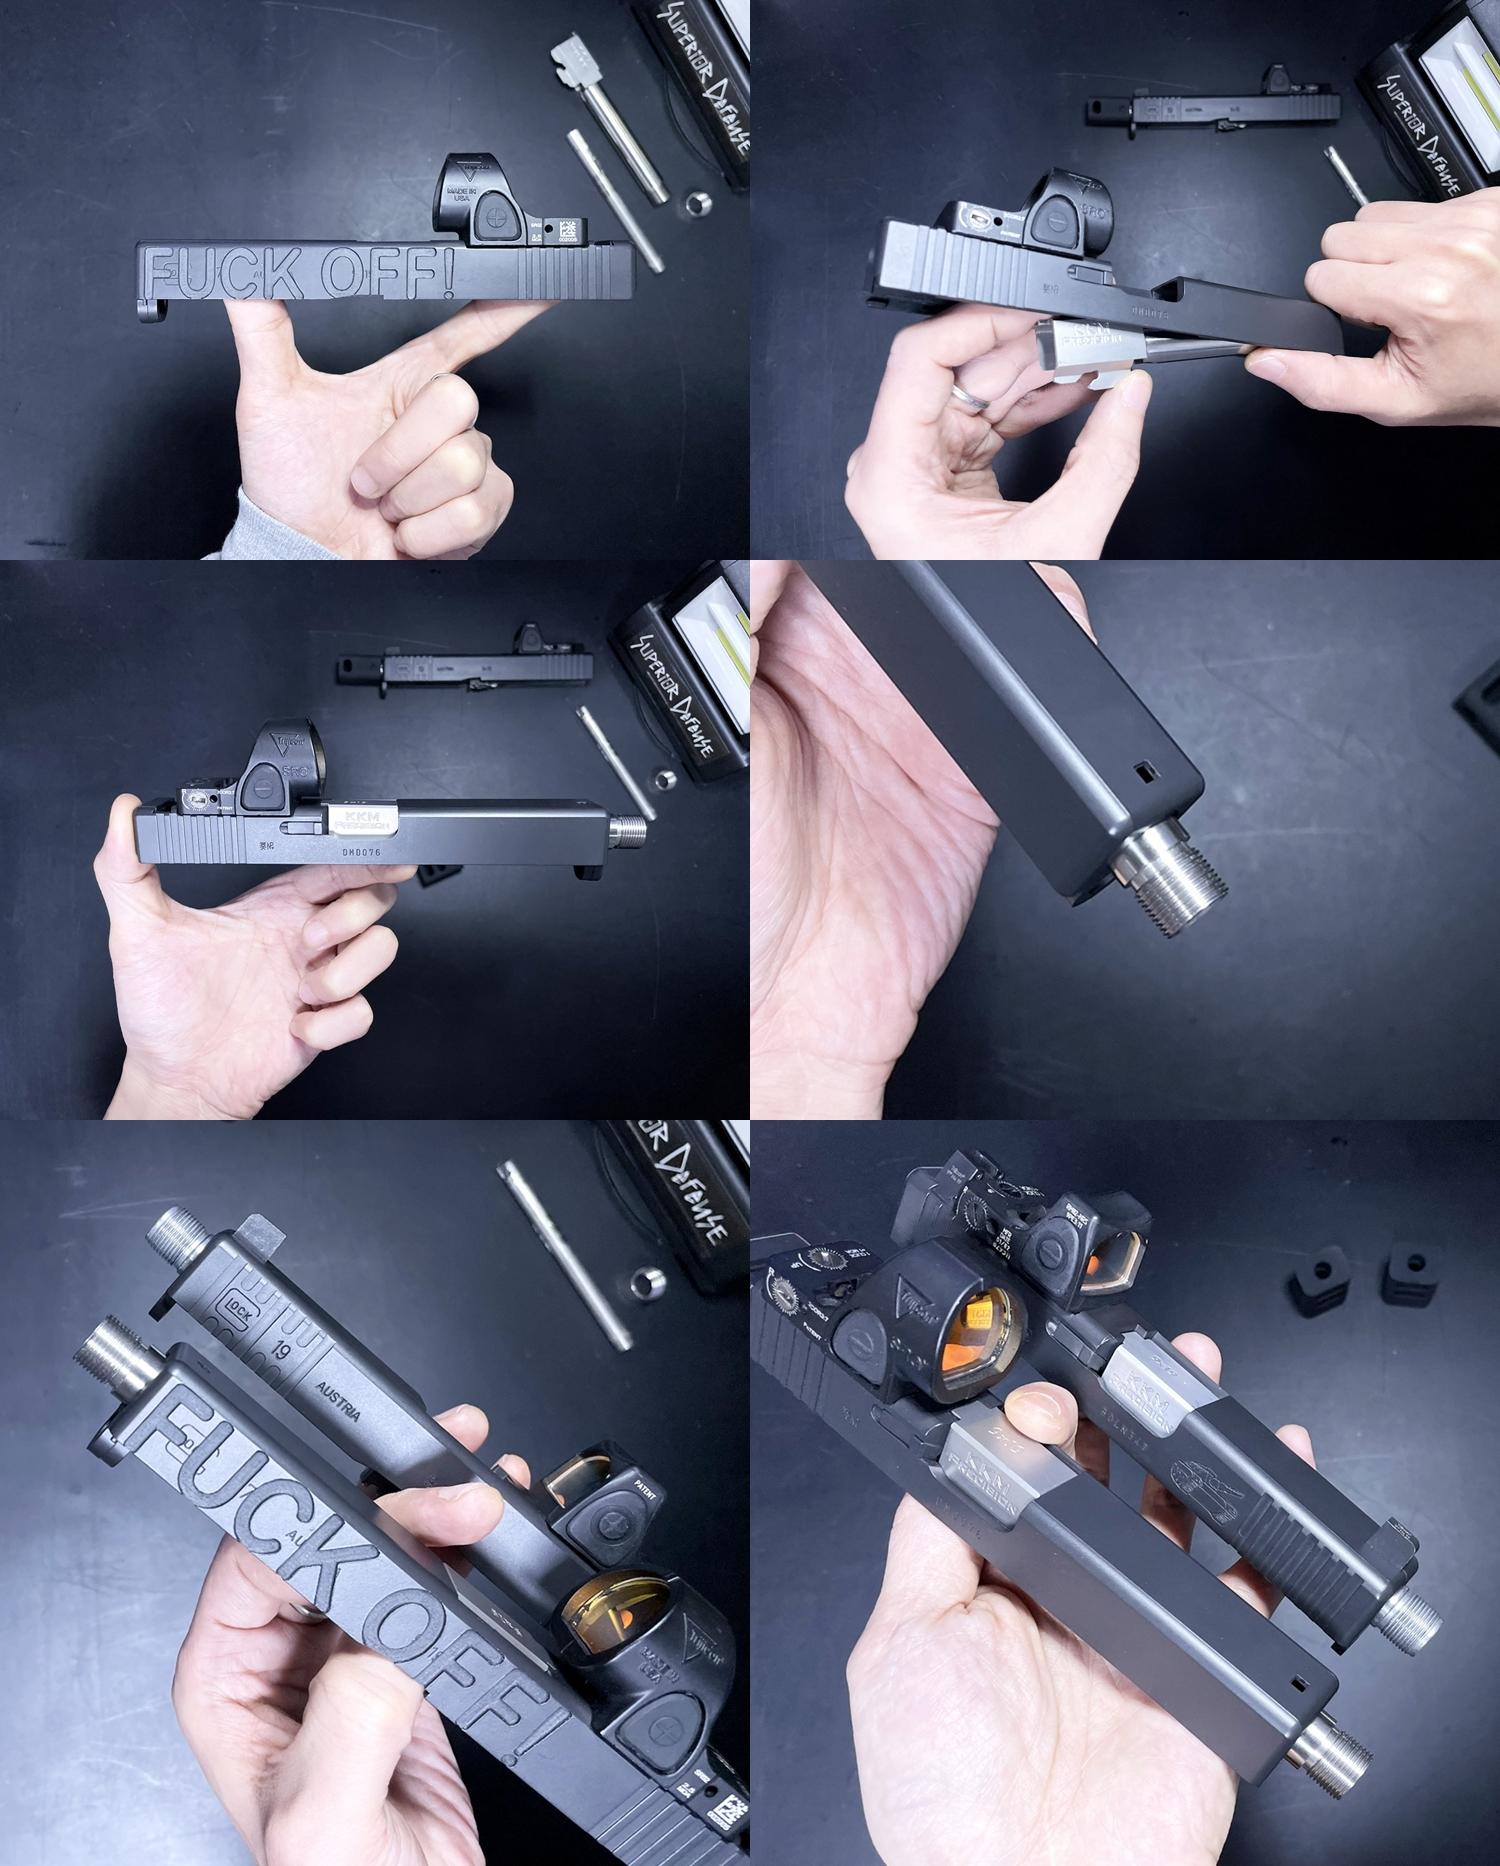 6 Guns Modify KKM PRECISION GLOCK ステンレスアウターバレル 東京マルイ G17 G18C GBB GET! リアルで重量感あるCNC 精密切り出し加工! BARREL+PROTECTOR+ショートリコイルアシストスプリング+インナーバレルセット